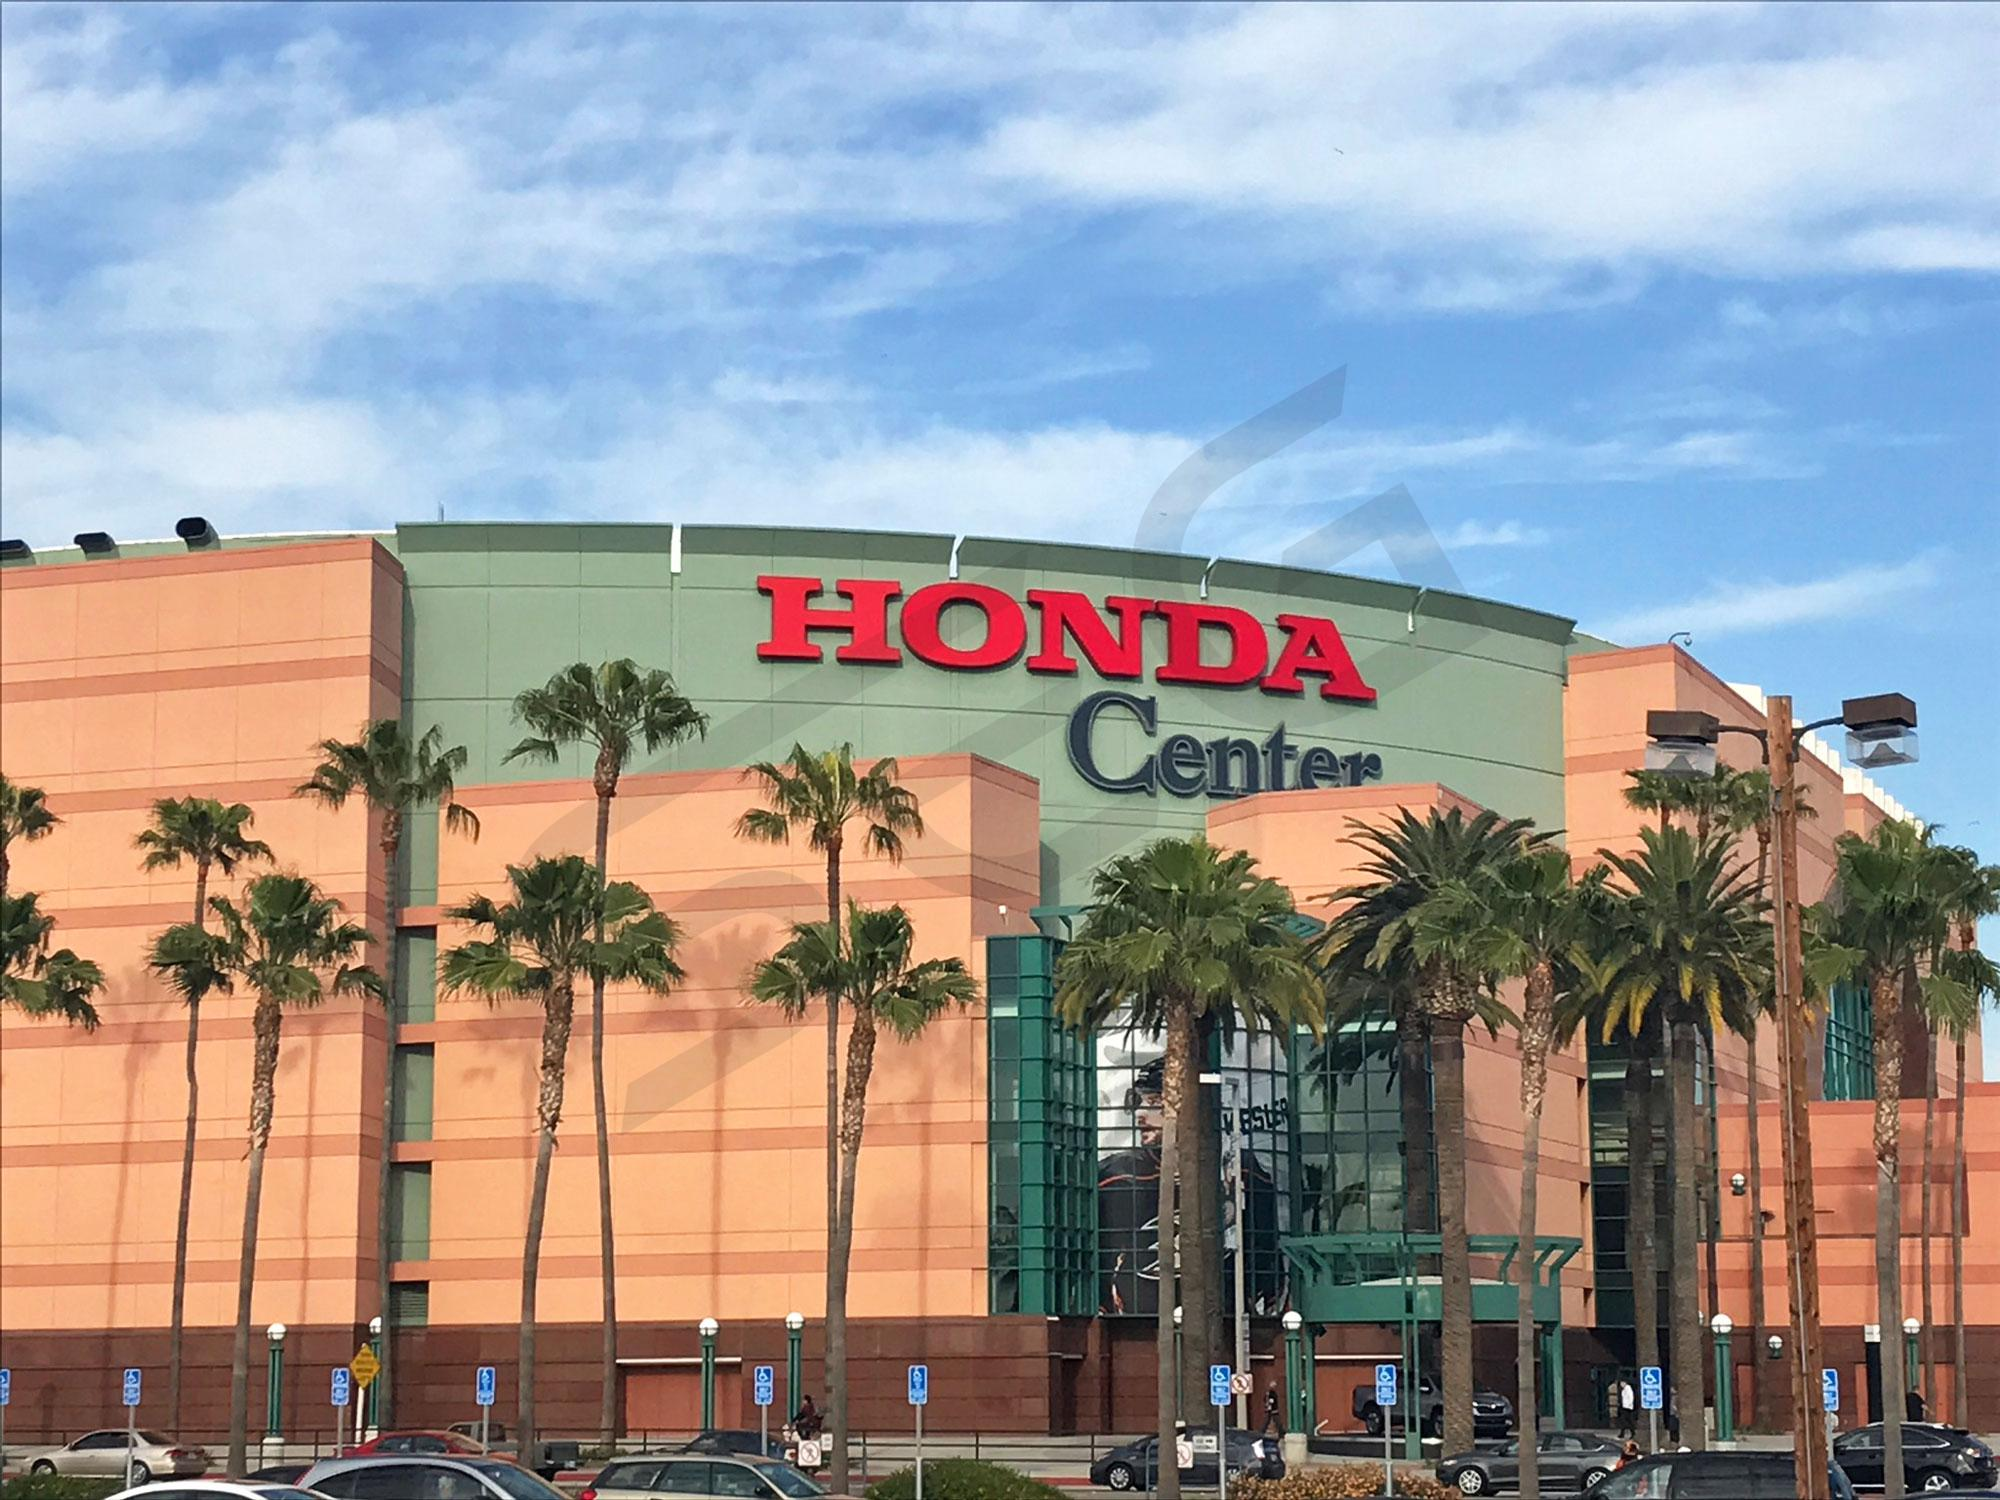 Anaheim ducks suite rentals honda center suite for Honda of downtown